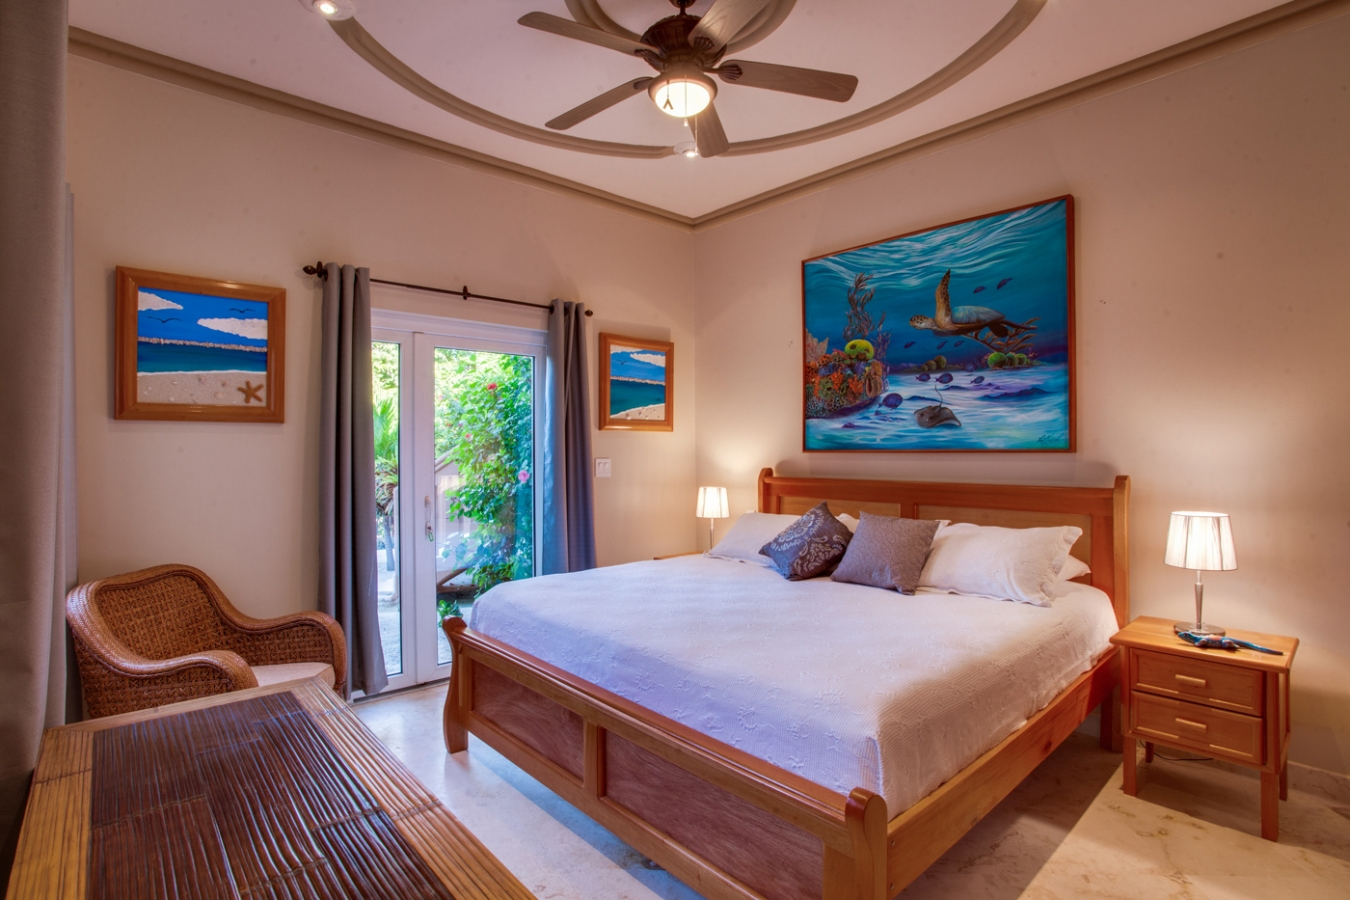 caribbean bedroom furniture. Caribbean Bedroom Furniture